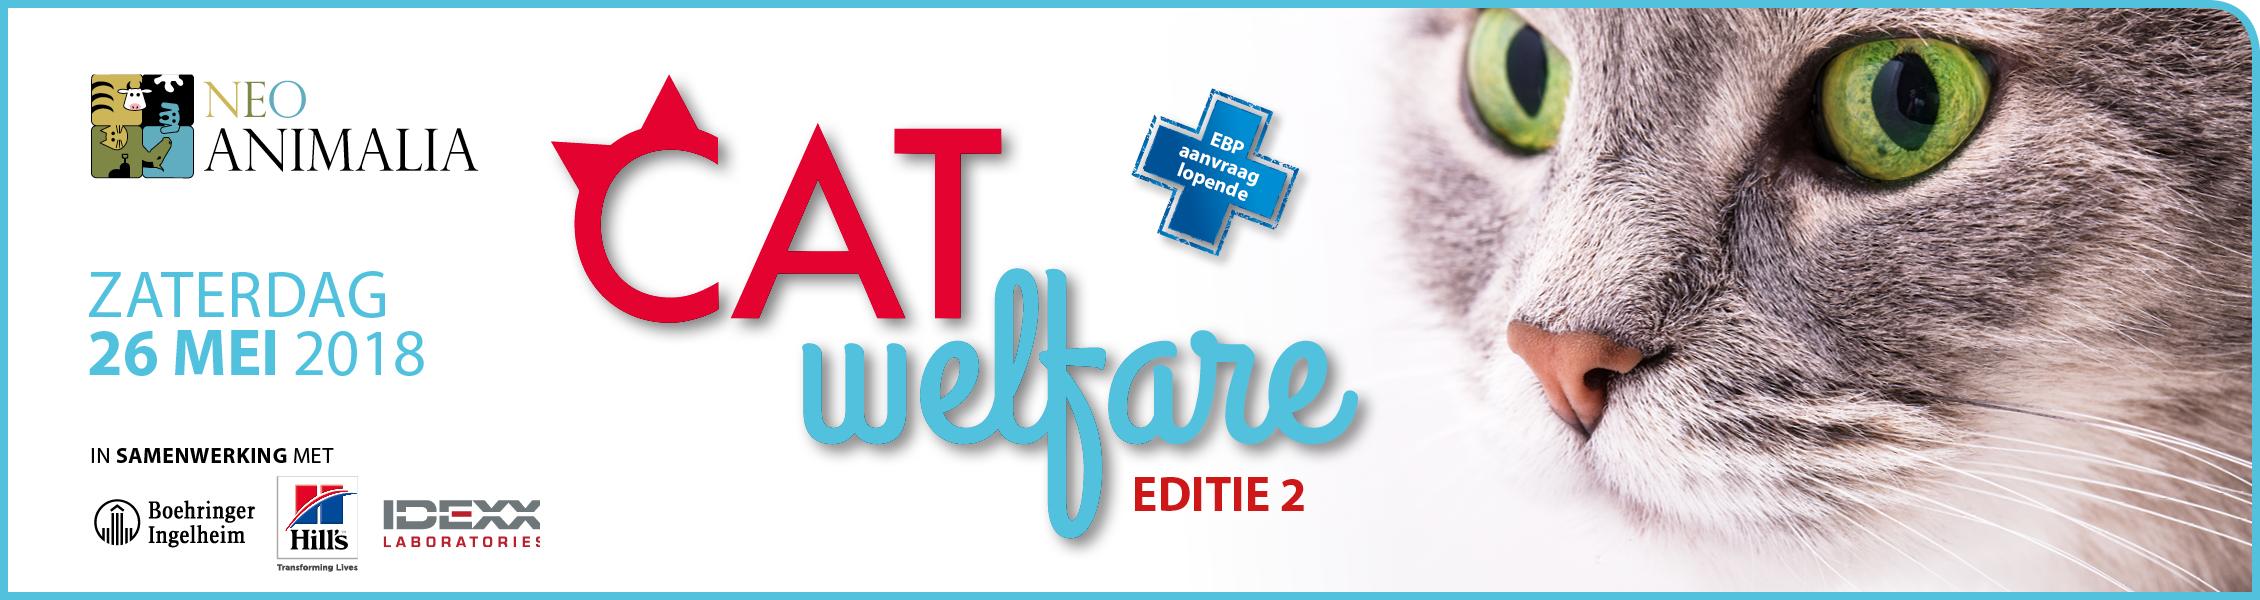 CAT Welfare Editie 2 NL